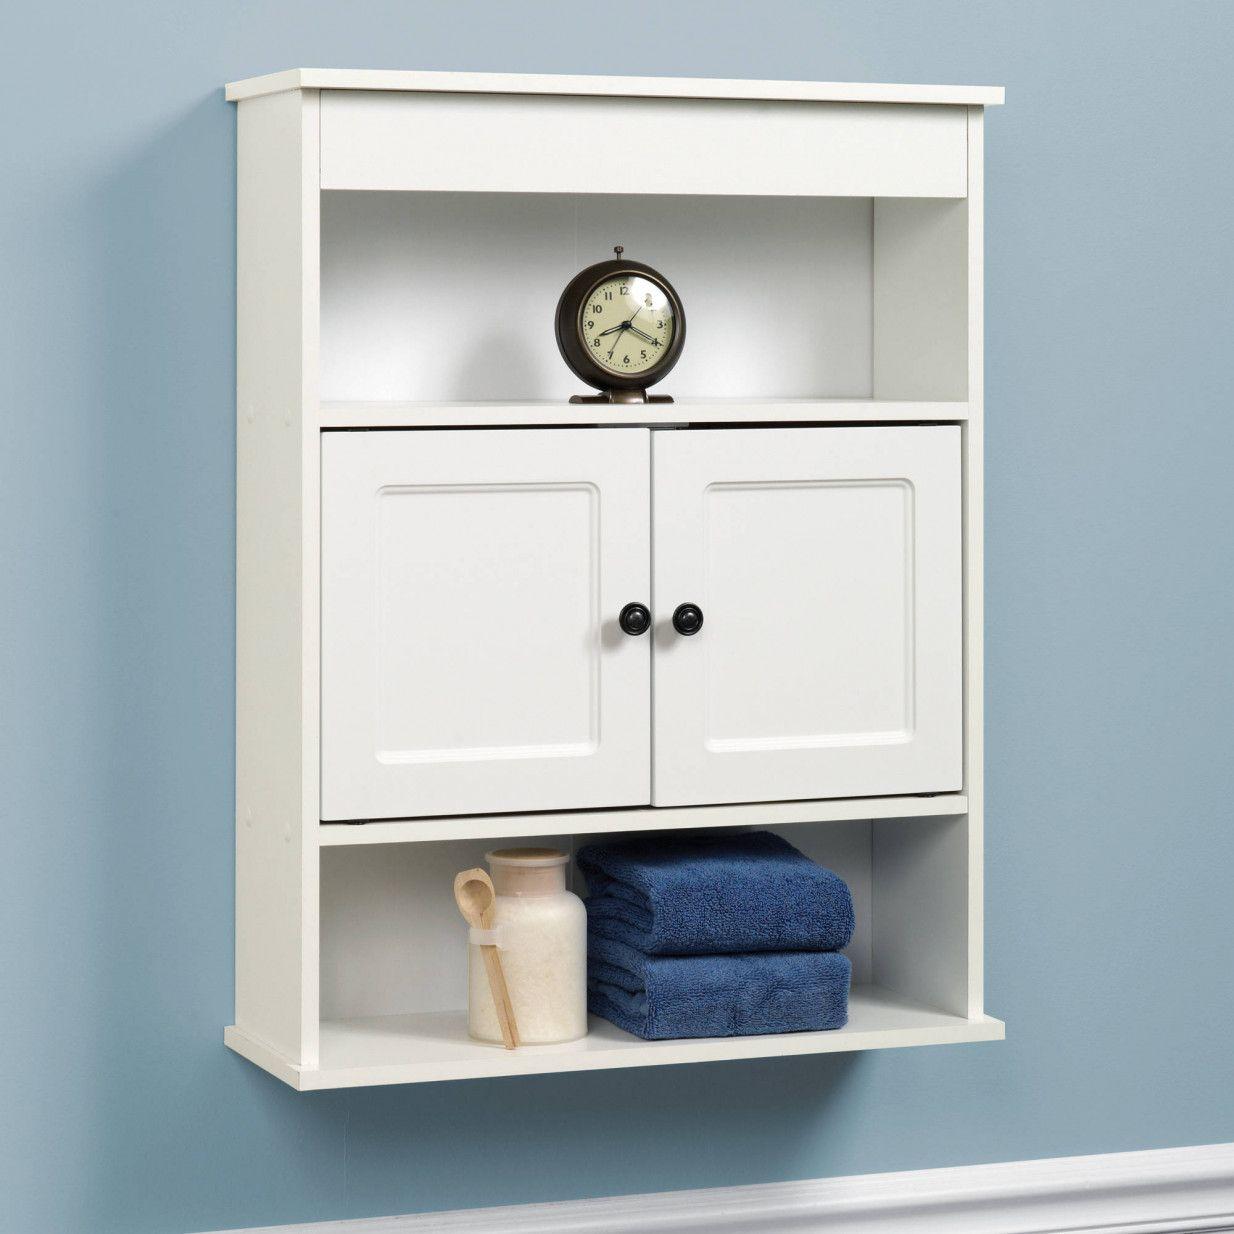 70 Bathroom Medicine Cabinets Walmart Interior Paint Colors